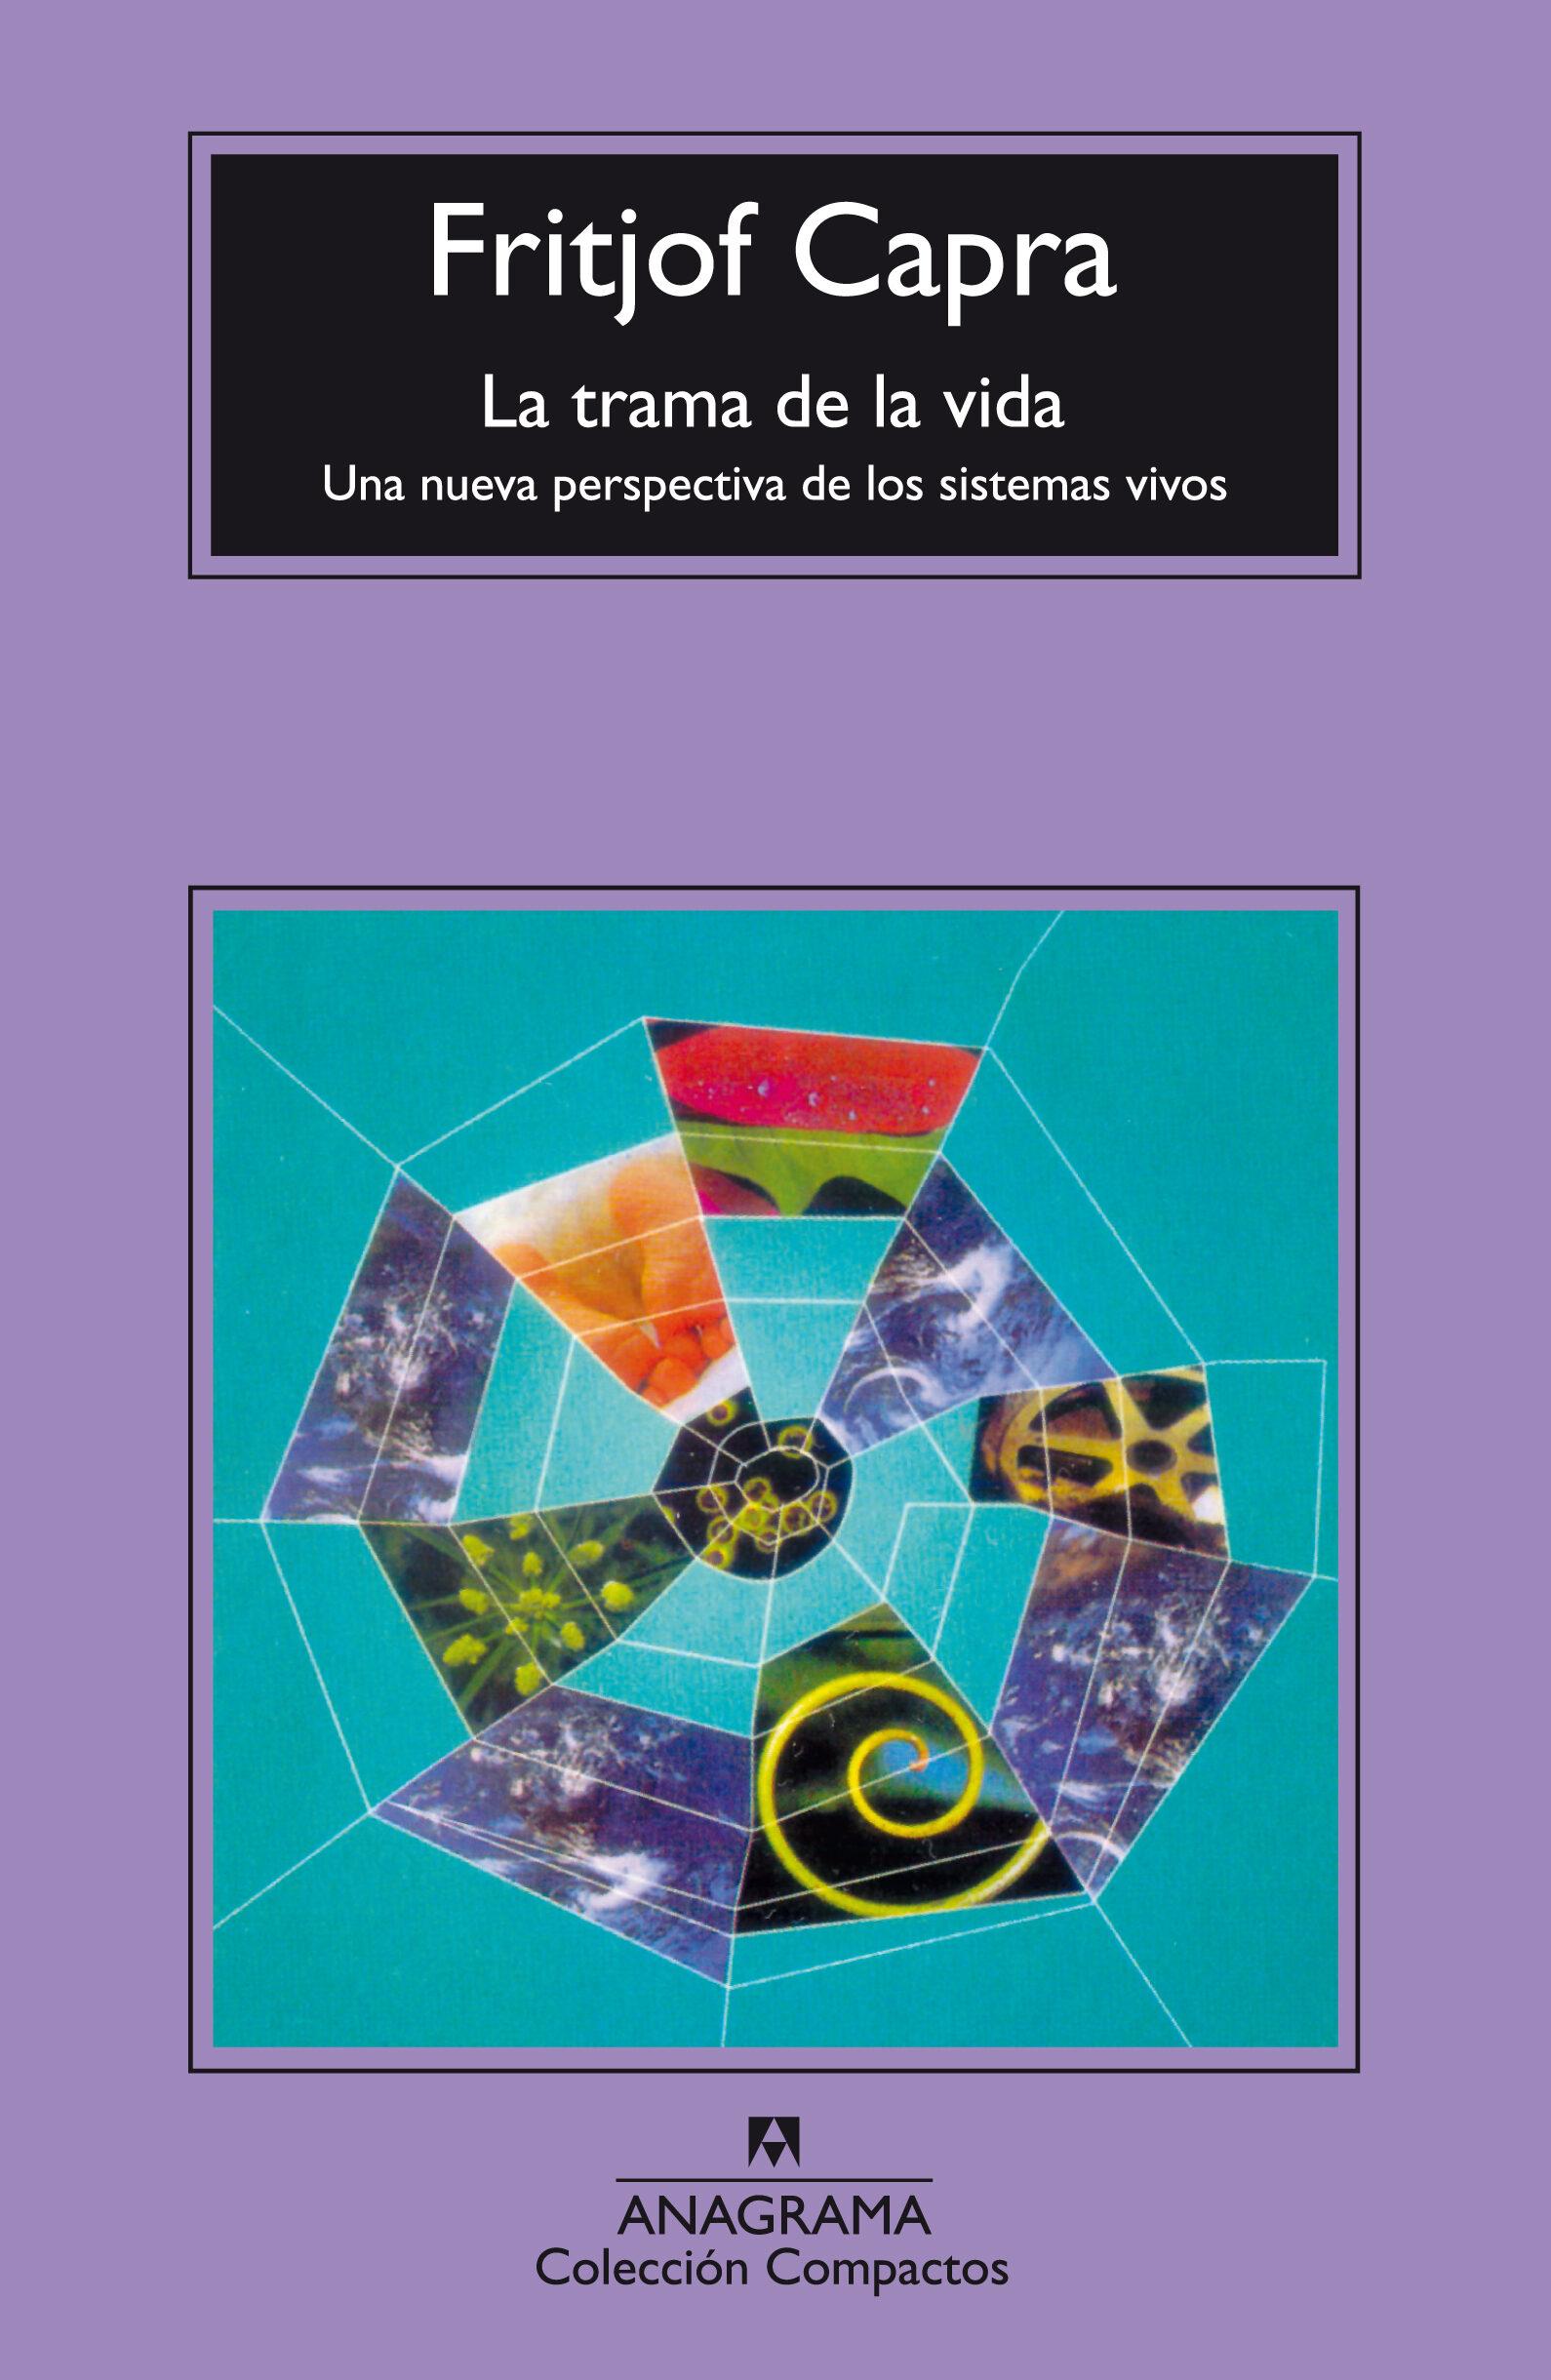 LA TRAMA DE LA VIDA (3ª ED.) | FRITJOF CAPRA | Comprar libro ...